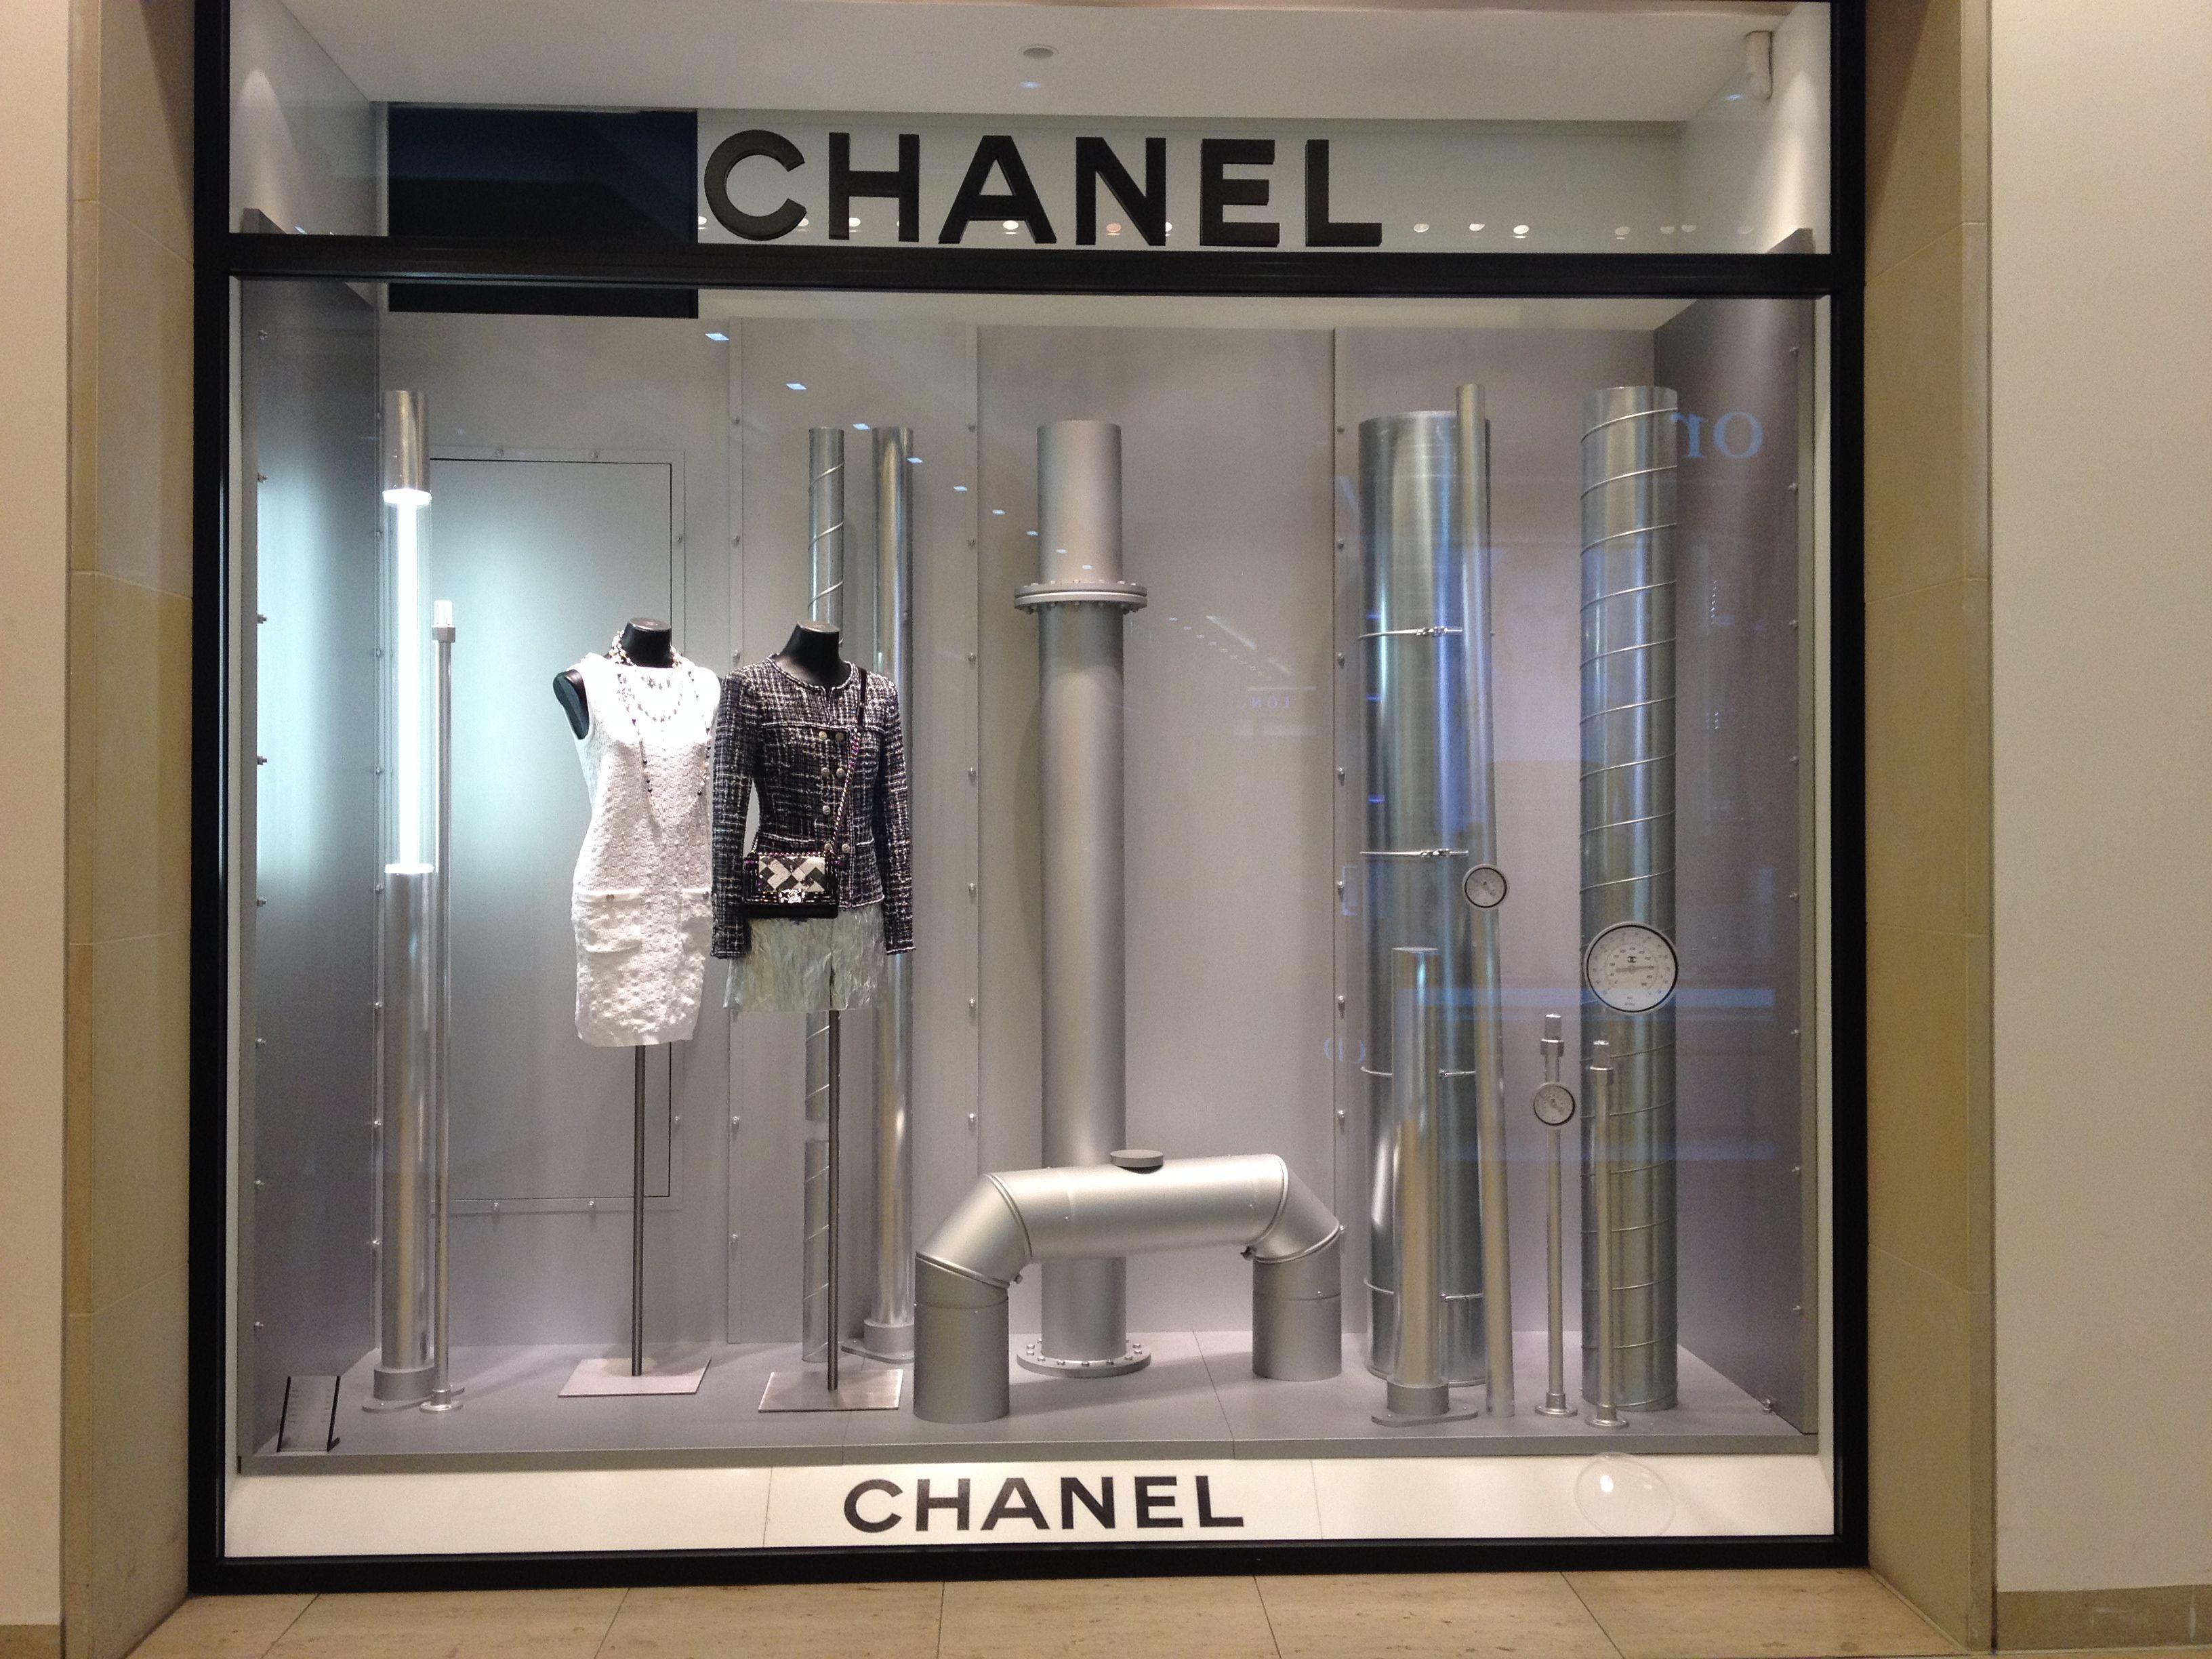 KaDeWe Department Store Chanel window display - 2014 | WINDOWS ...